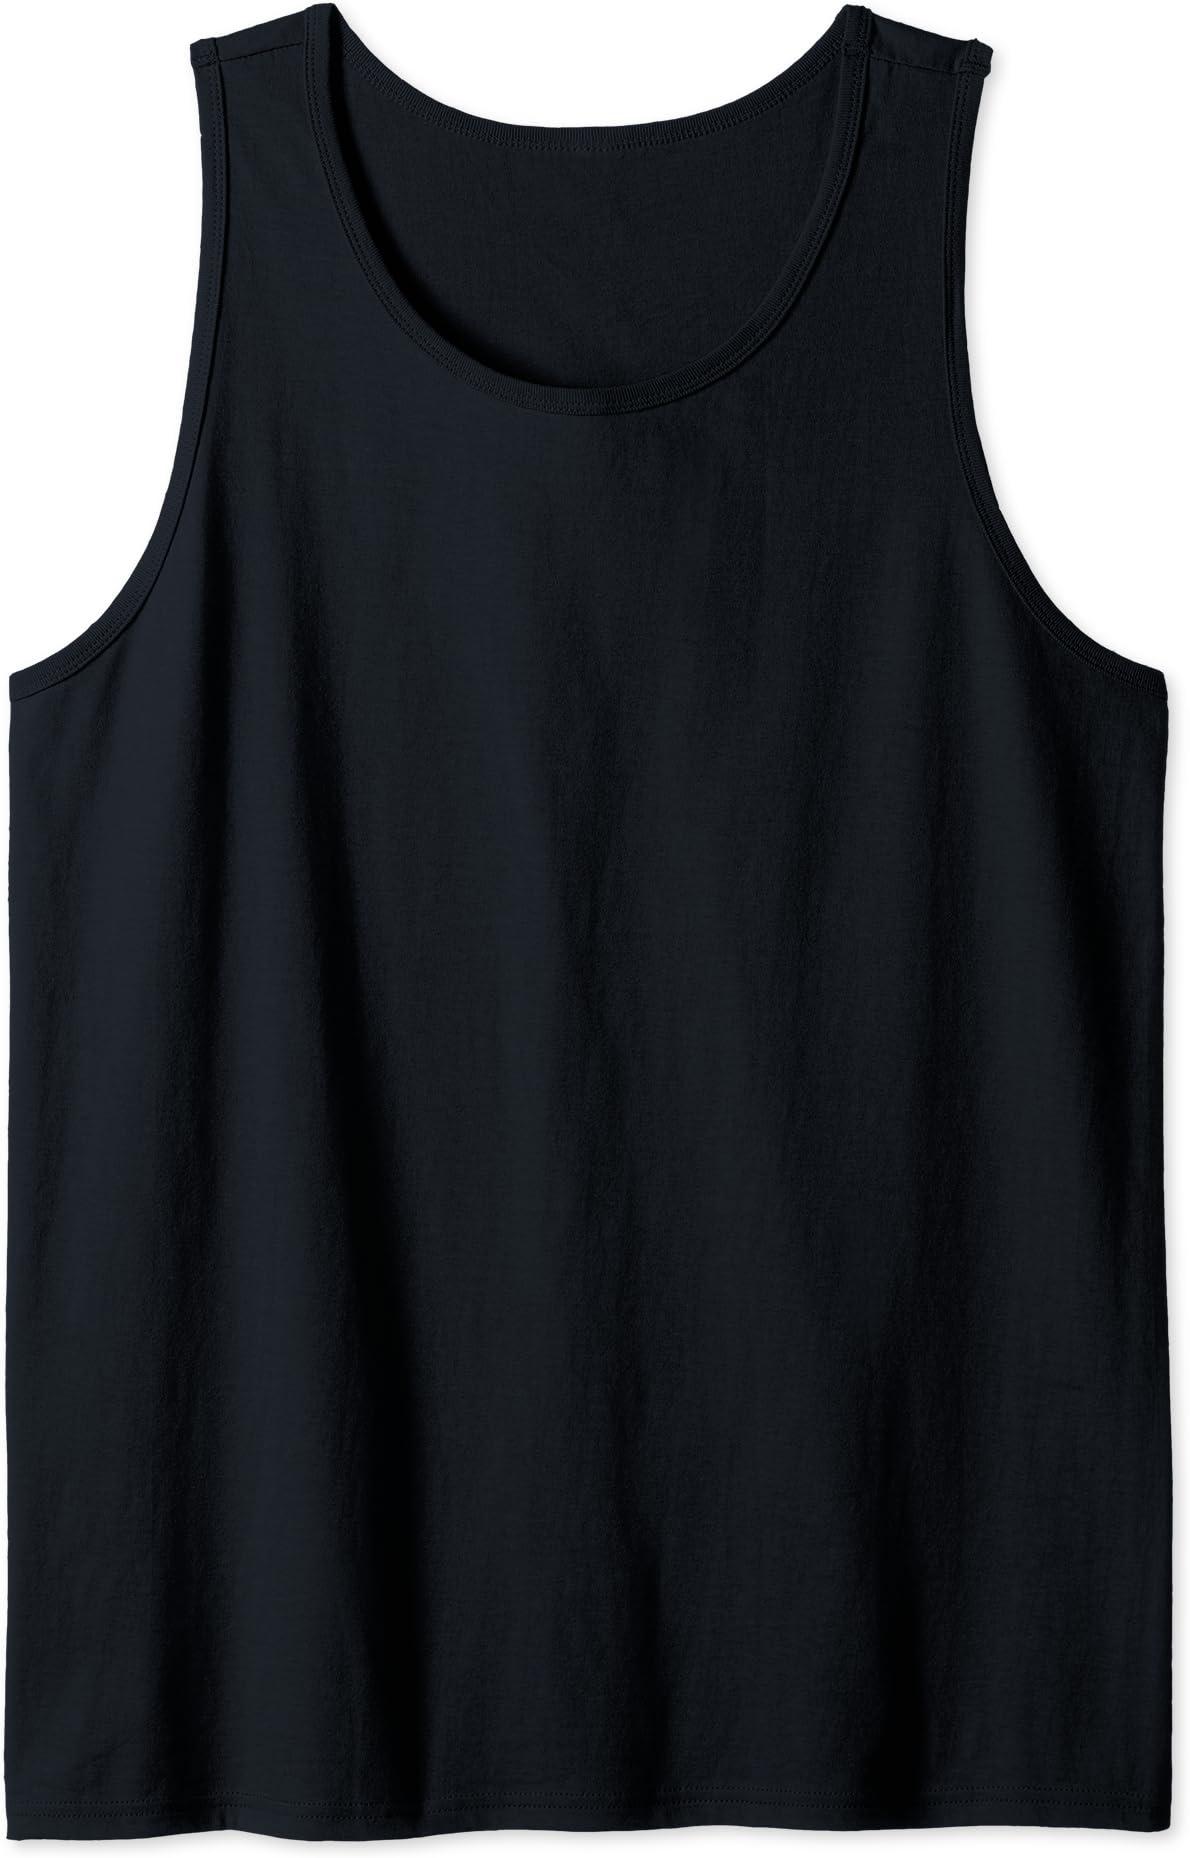 Aunty Shark Doo Doo Shirt Matching Family Shark T-Shirt Sweatshirt Hoodie Tank Top For Men Women Kids